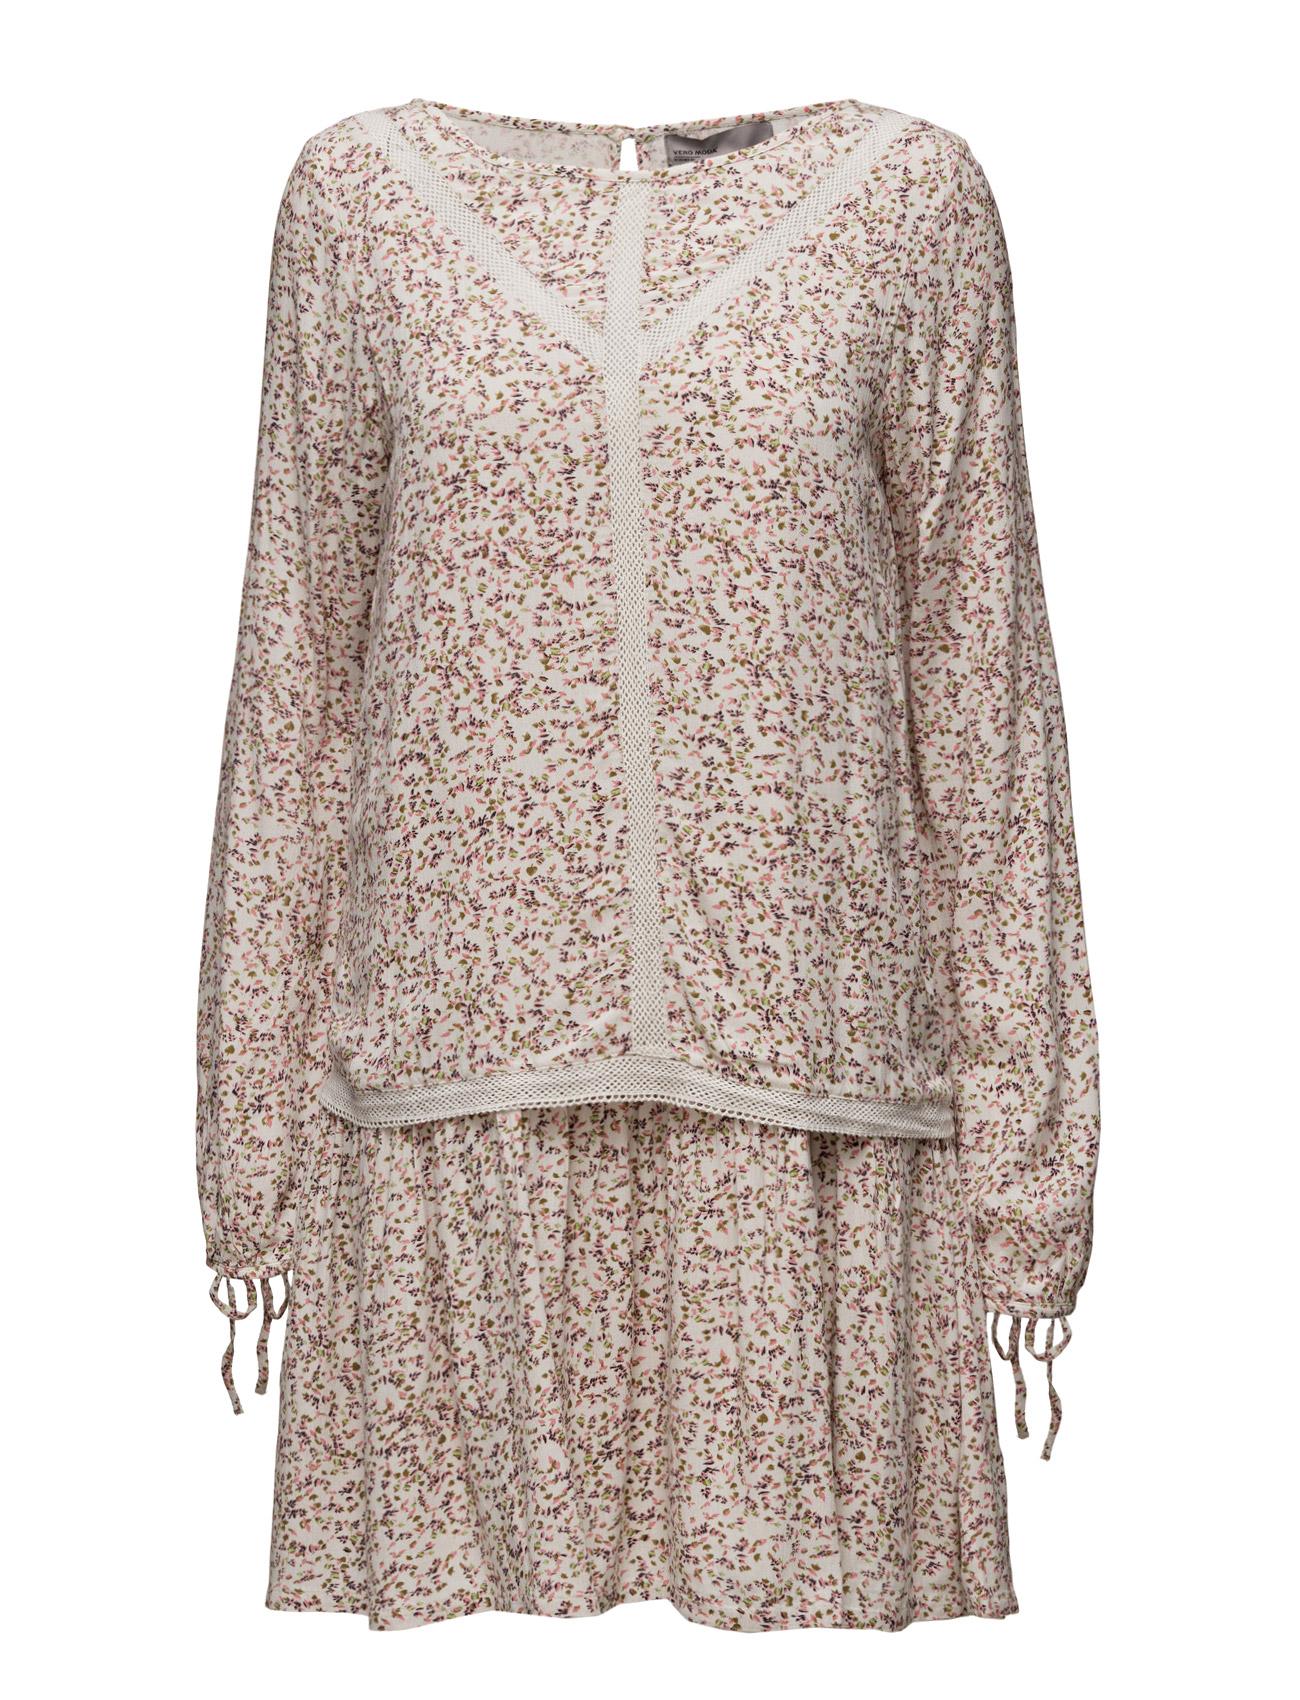 Vmfauna L/S Short Dress Wp2 Vero Moda Korte kjoler til Kvinder i Månestråle